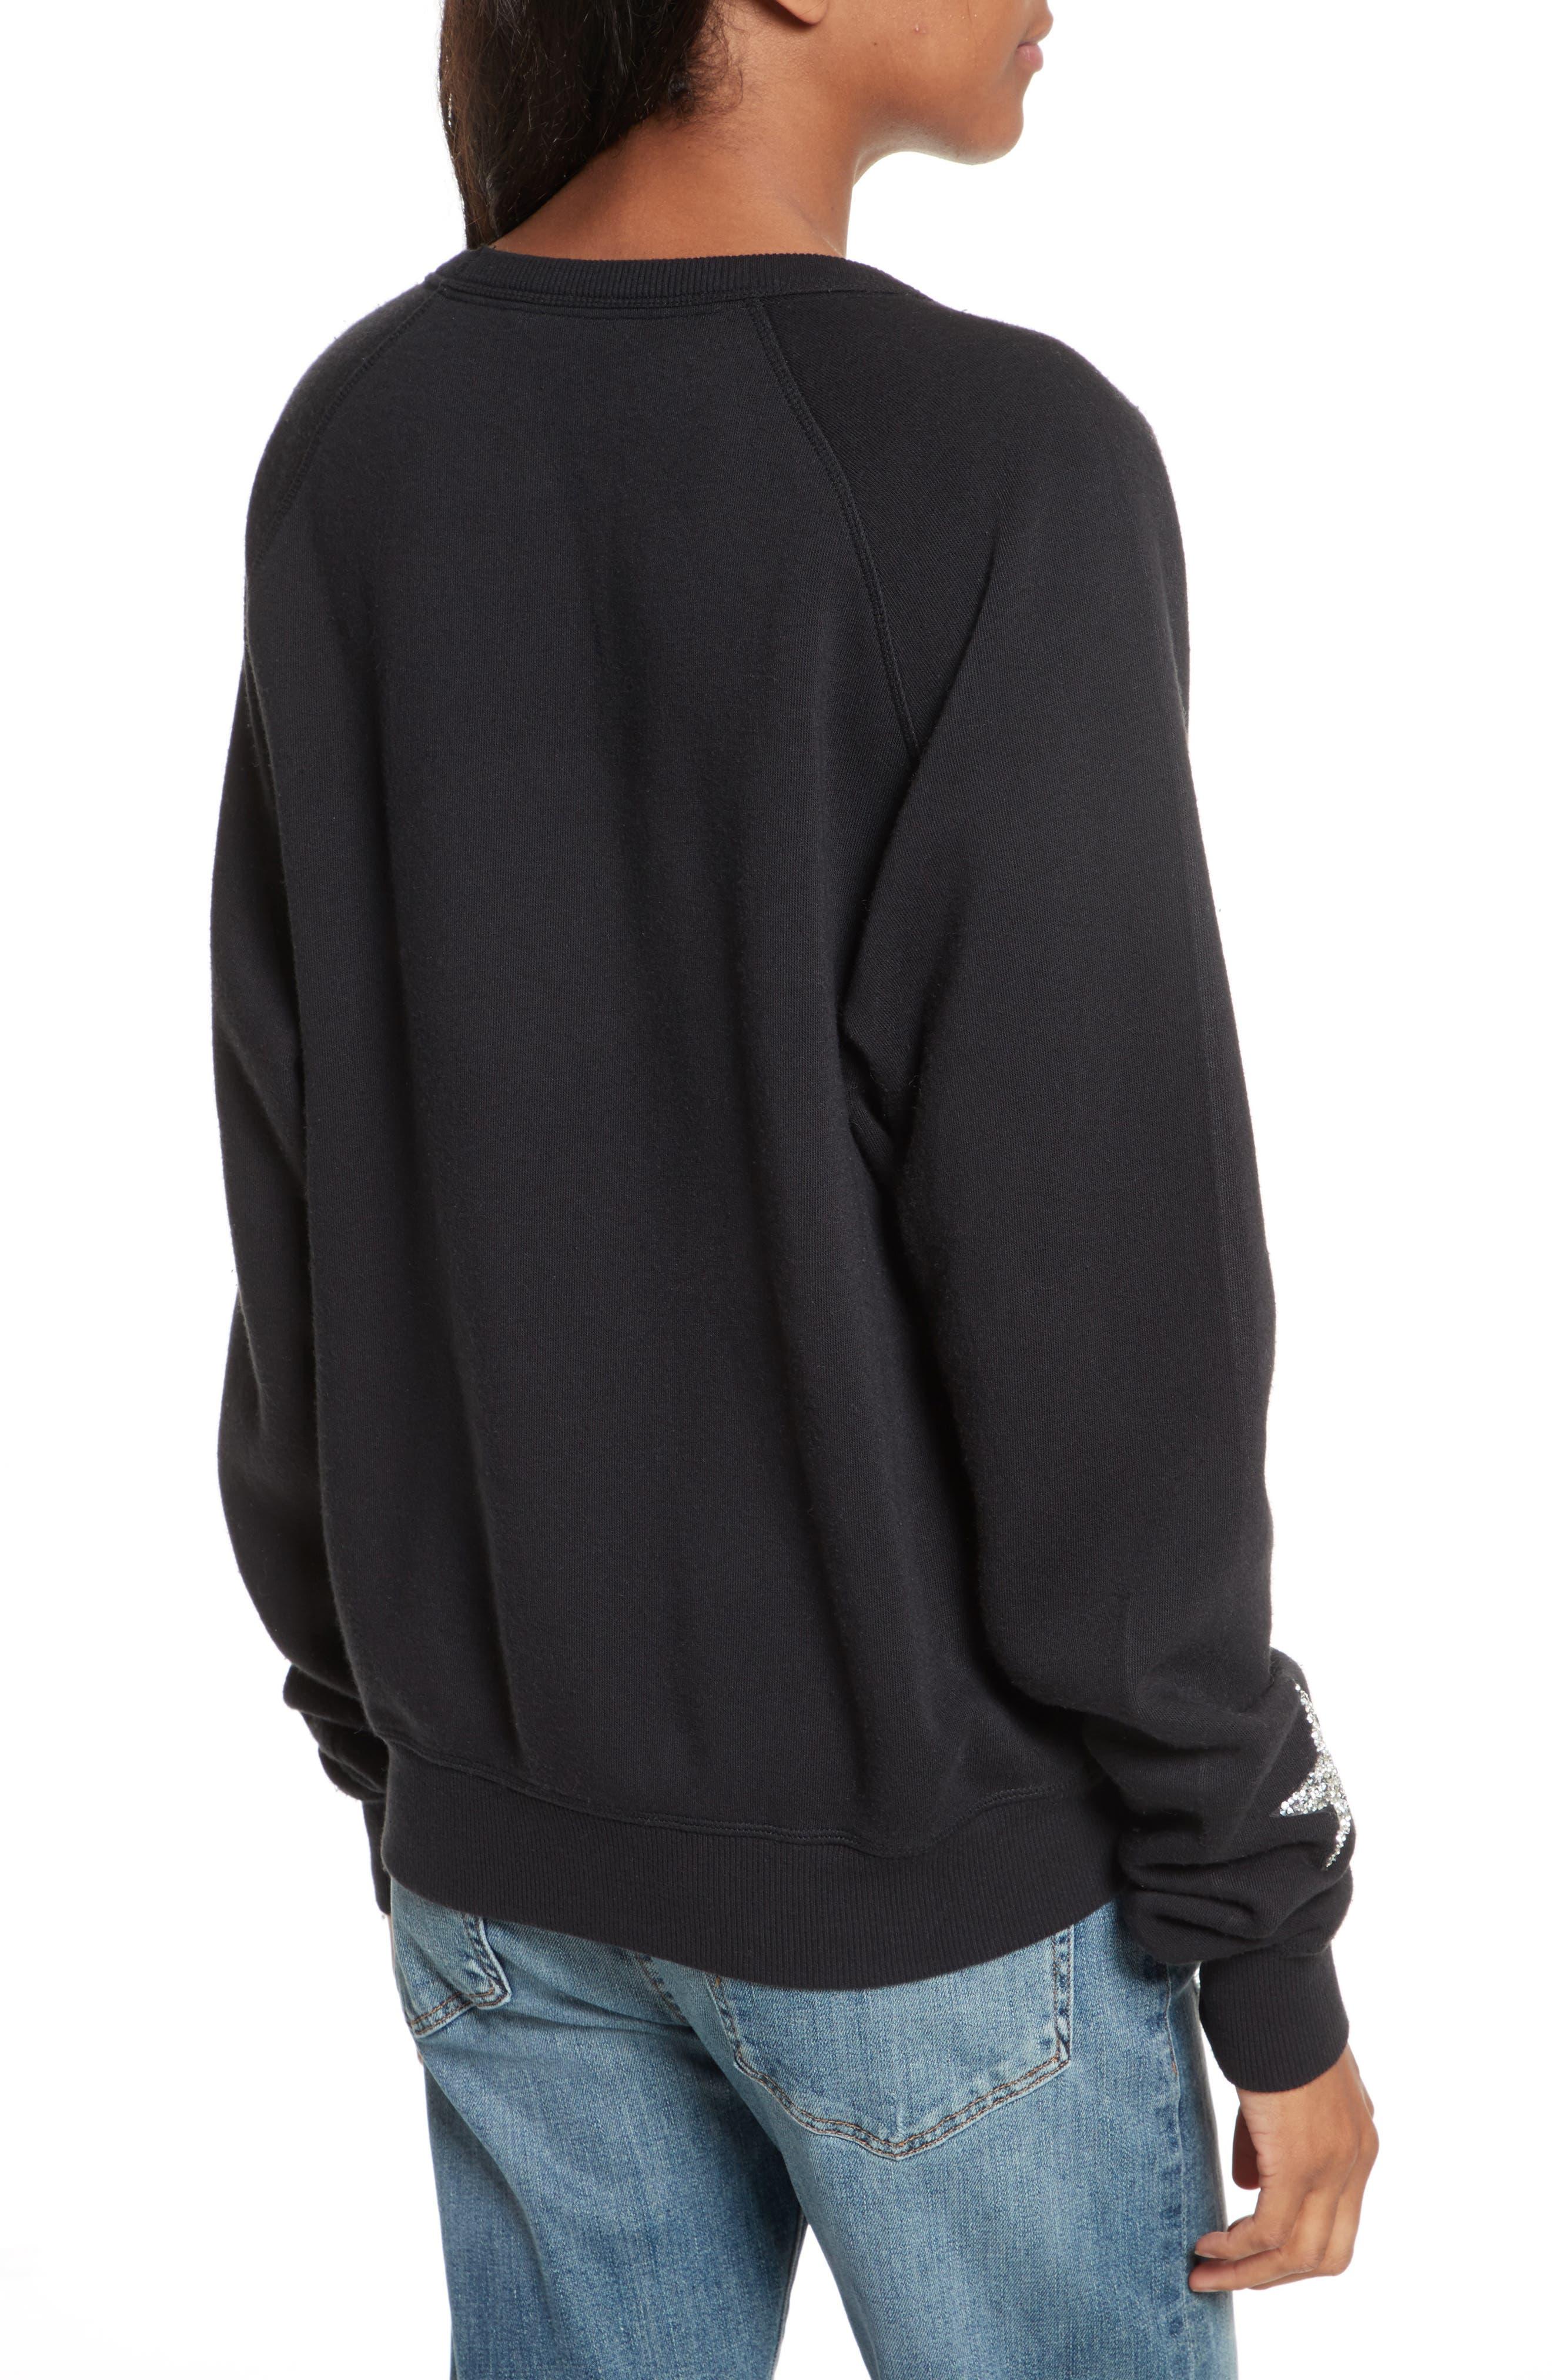 Graham Embellished Sweatshirt,                             Alternate thumbnail 2, color,                             001